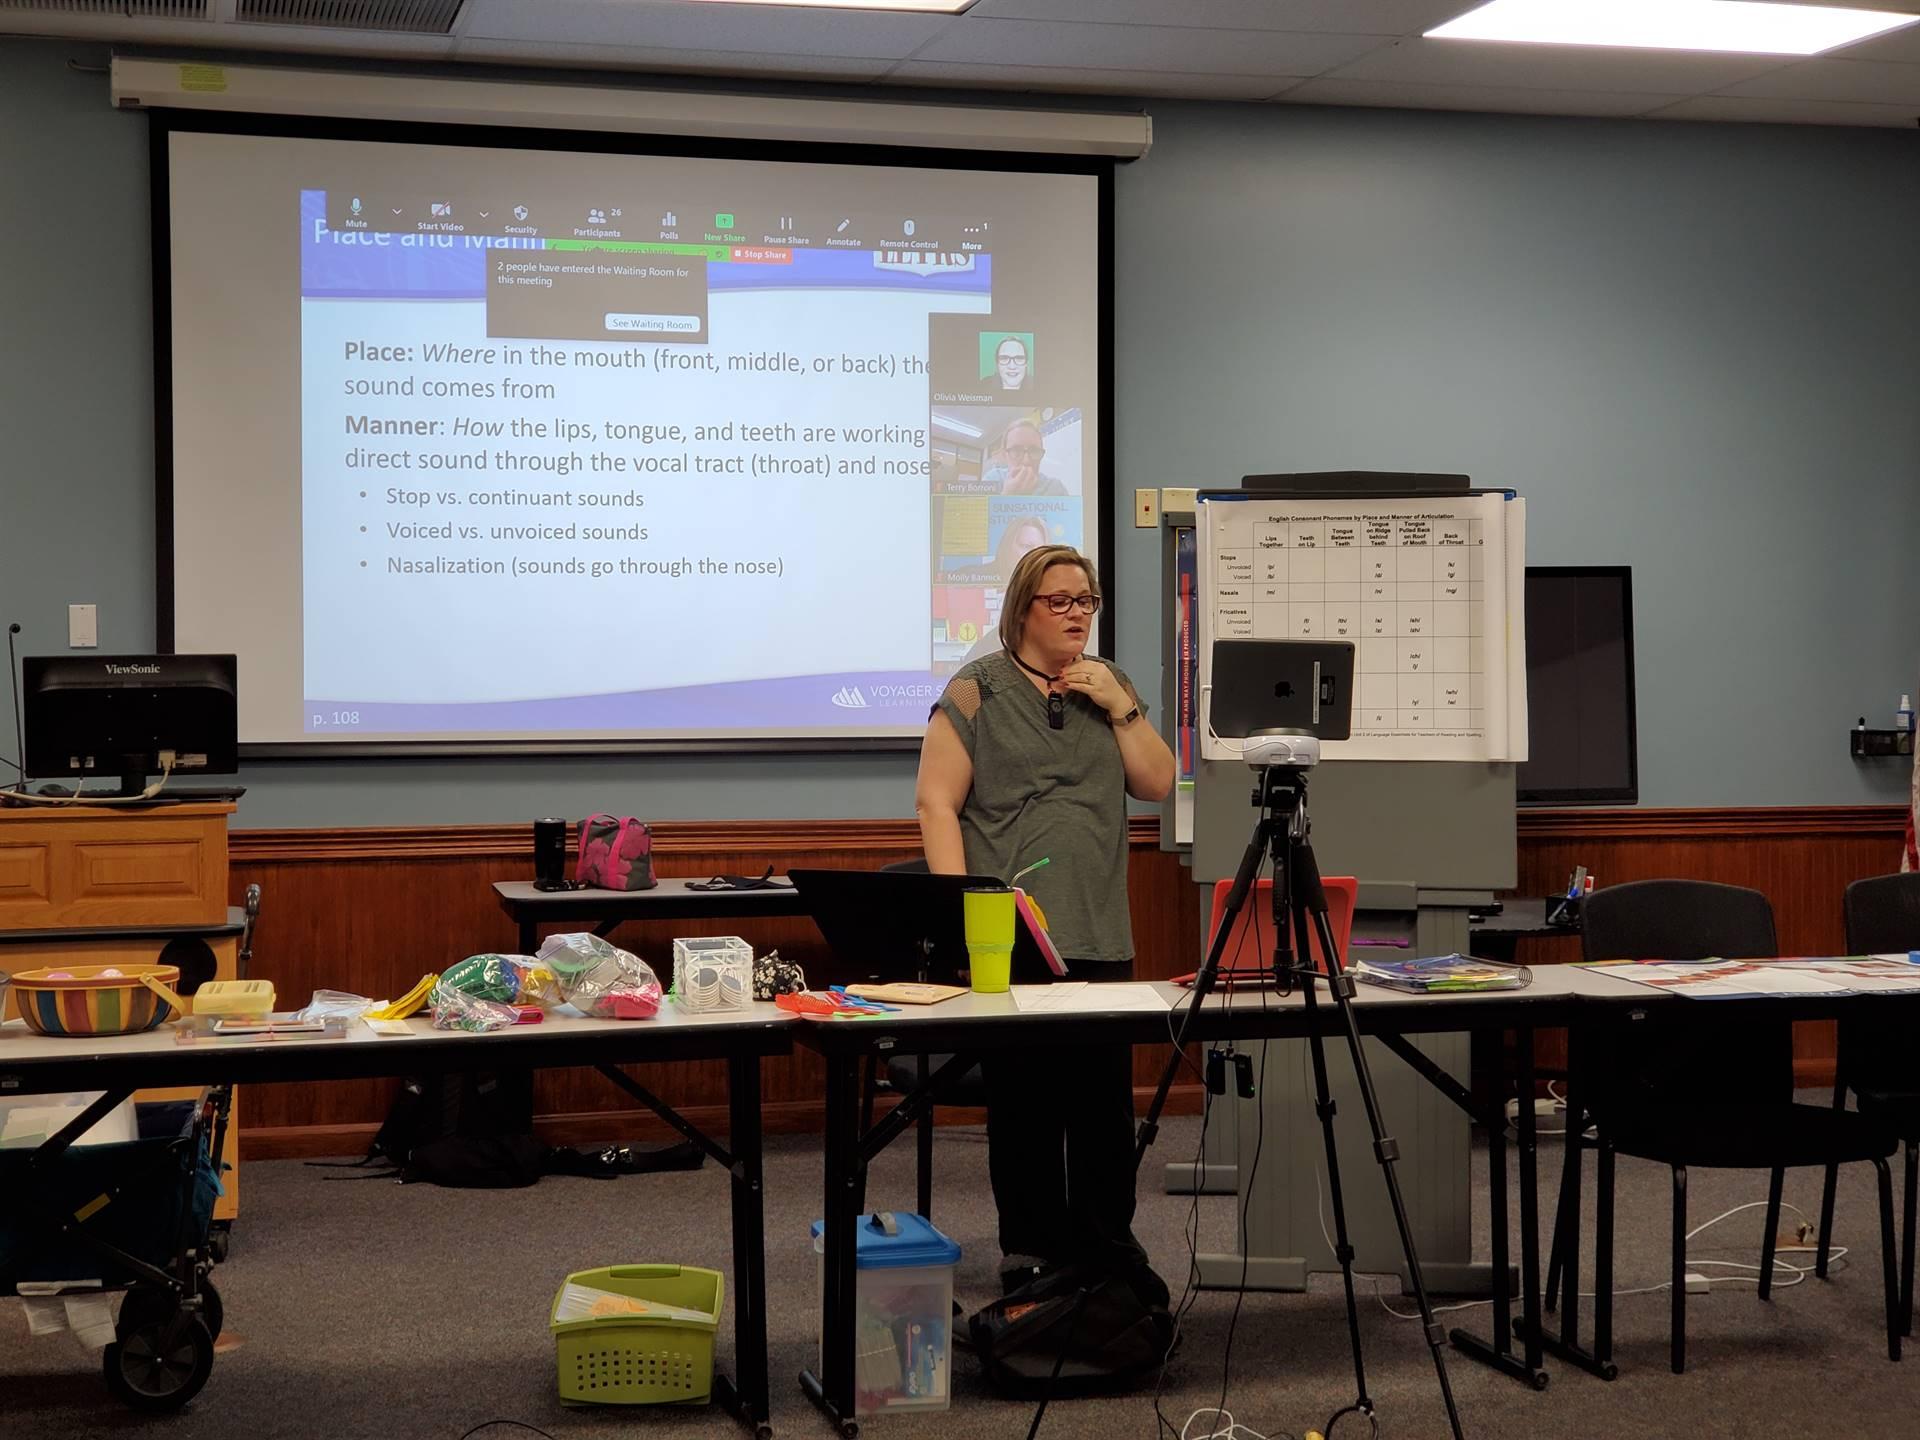 lady presenting